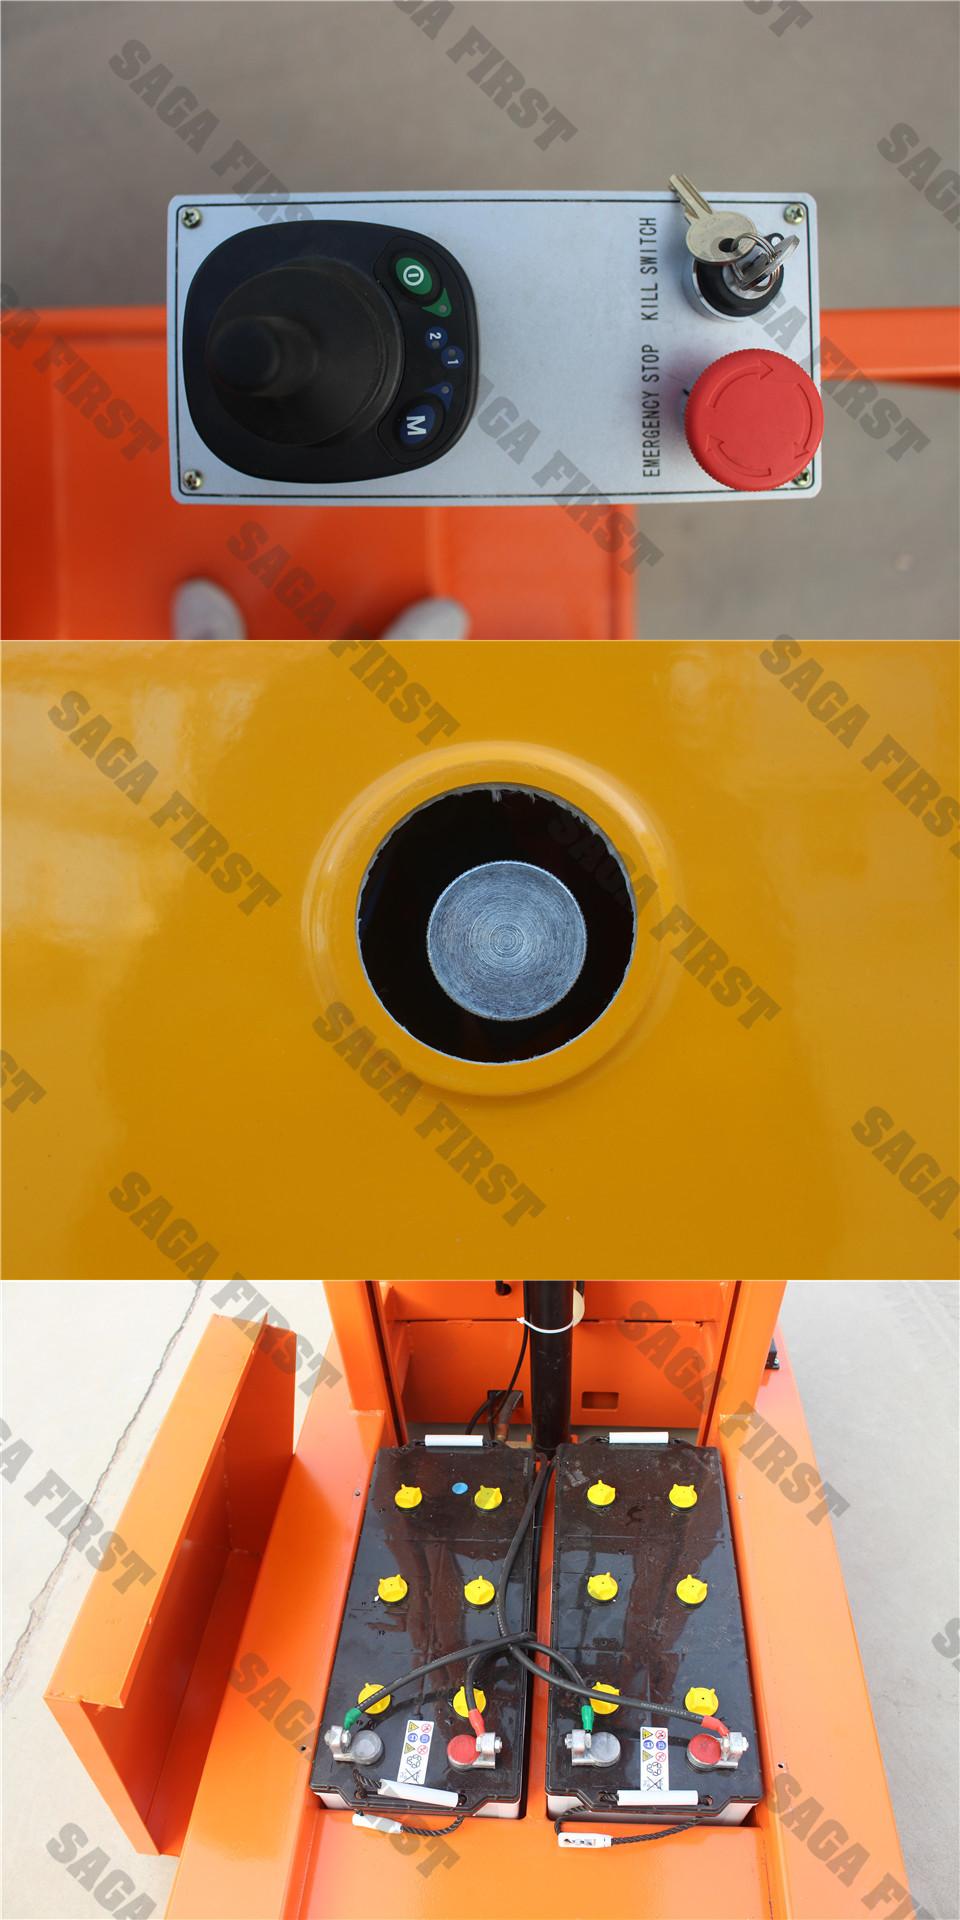 HTB1RXOikuKAUKJjSZFzq6xdQFXaZ - CE Certificated Lifting Equipment Mobile Cargo Lift Electric Stacker